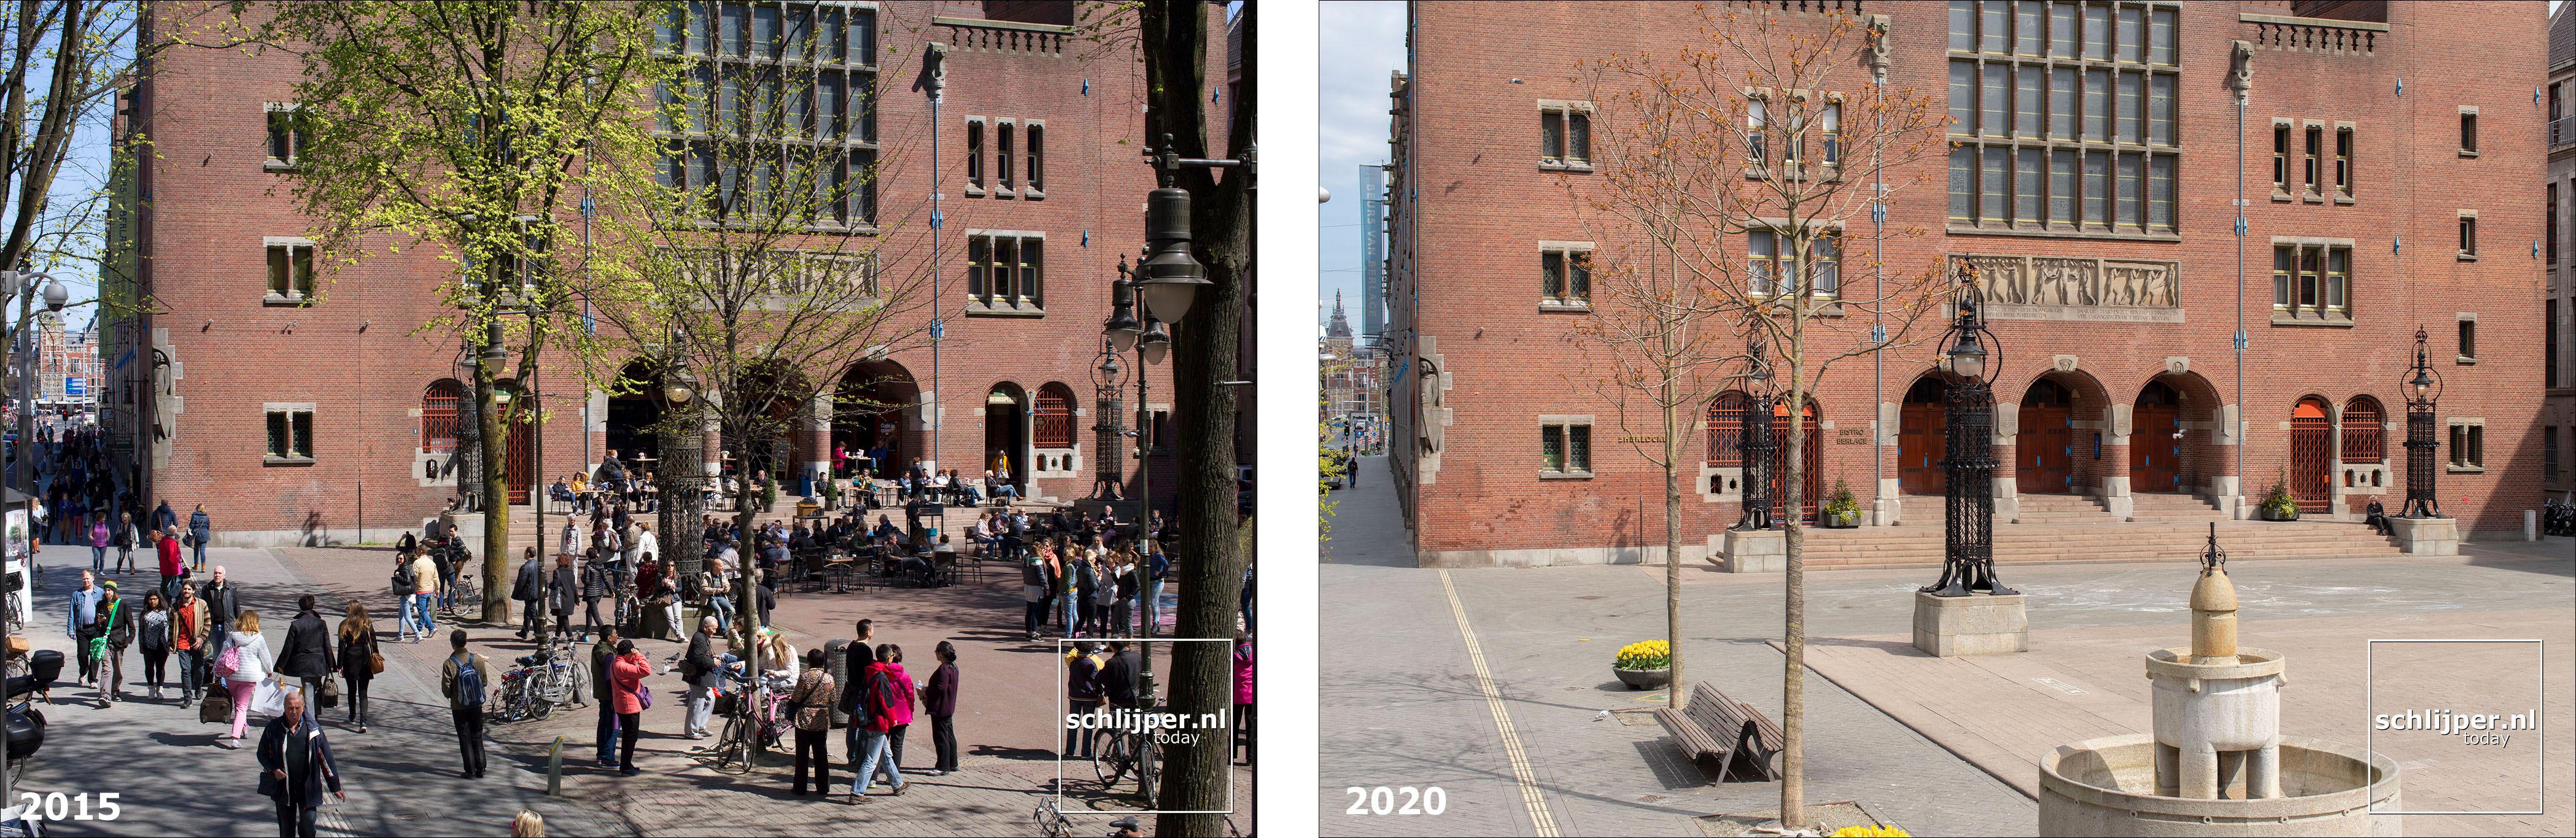 Nederland, Amsterdam, 18 april 2020